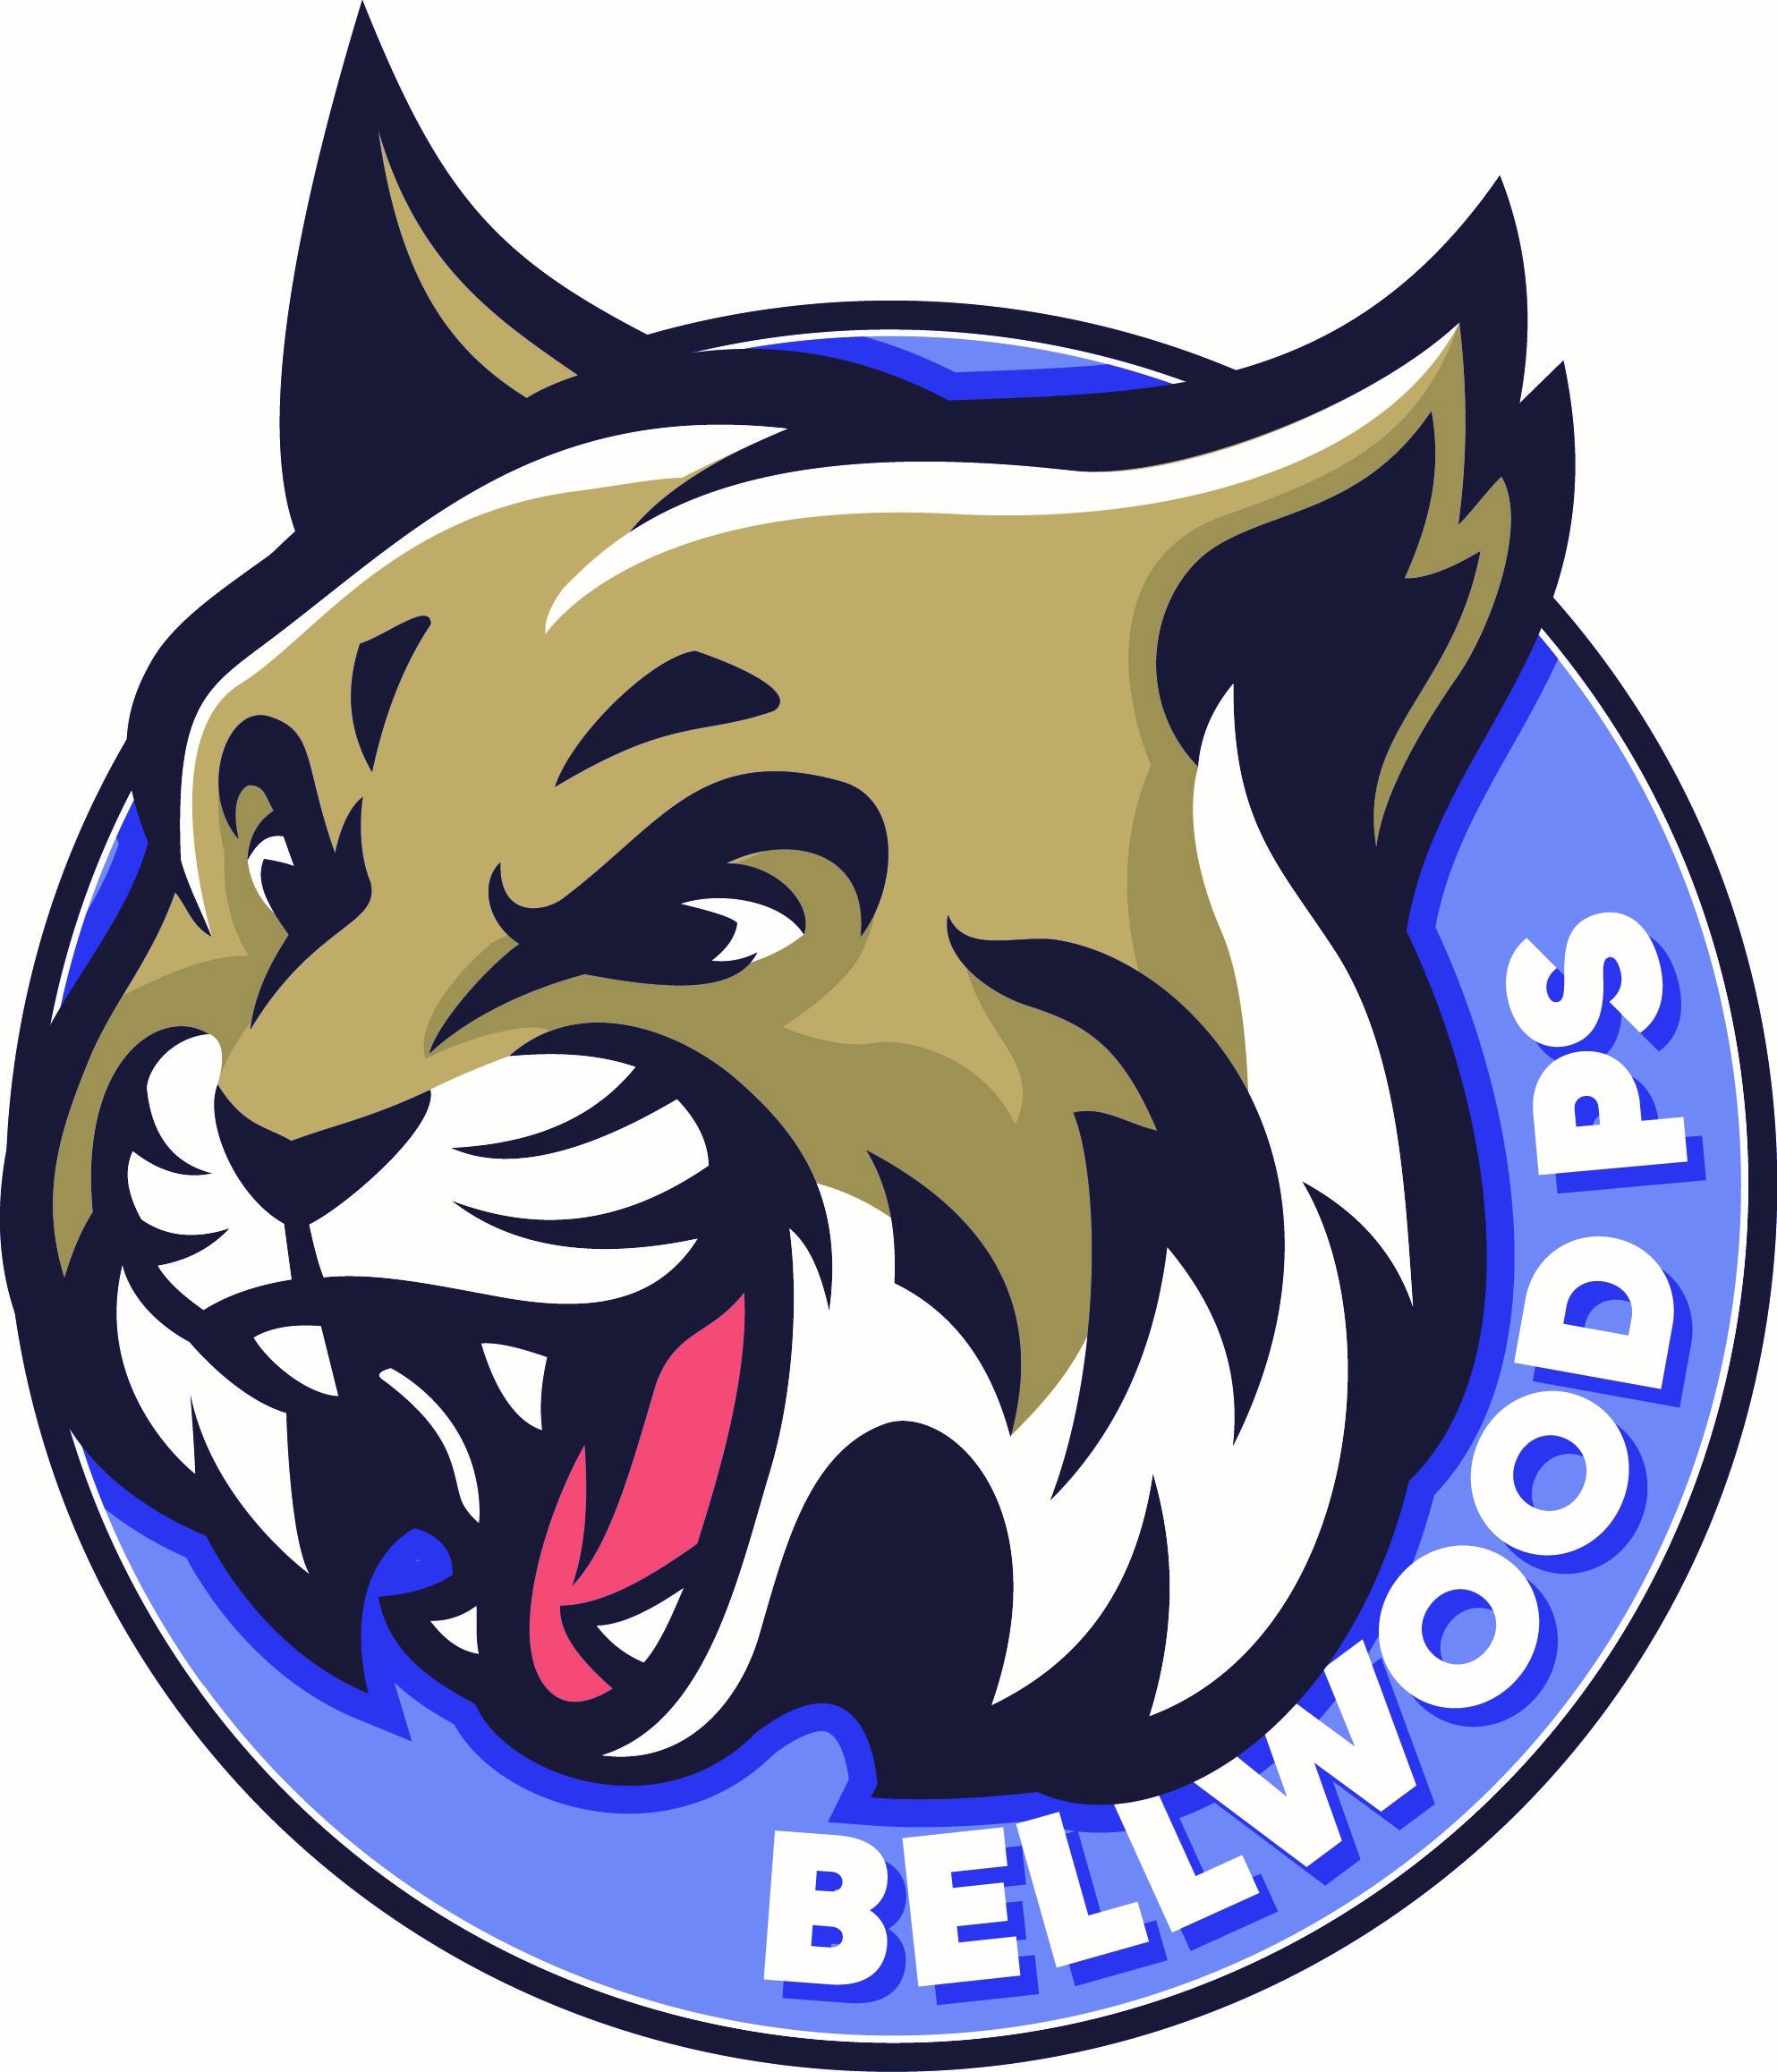 Bellwood logo